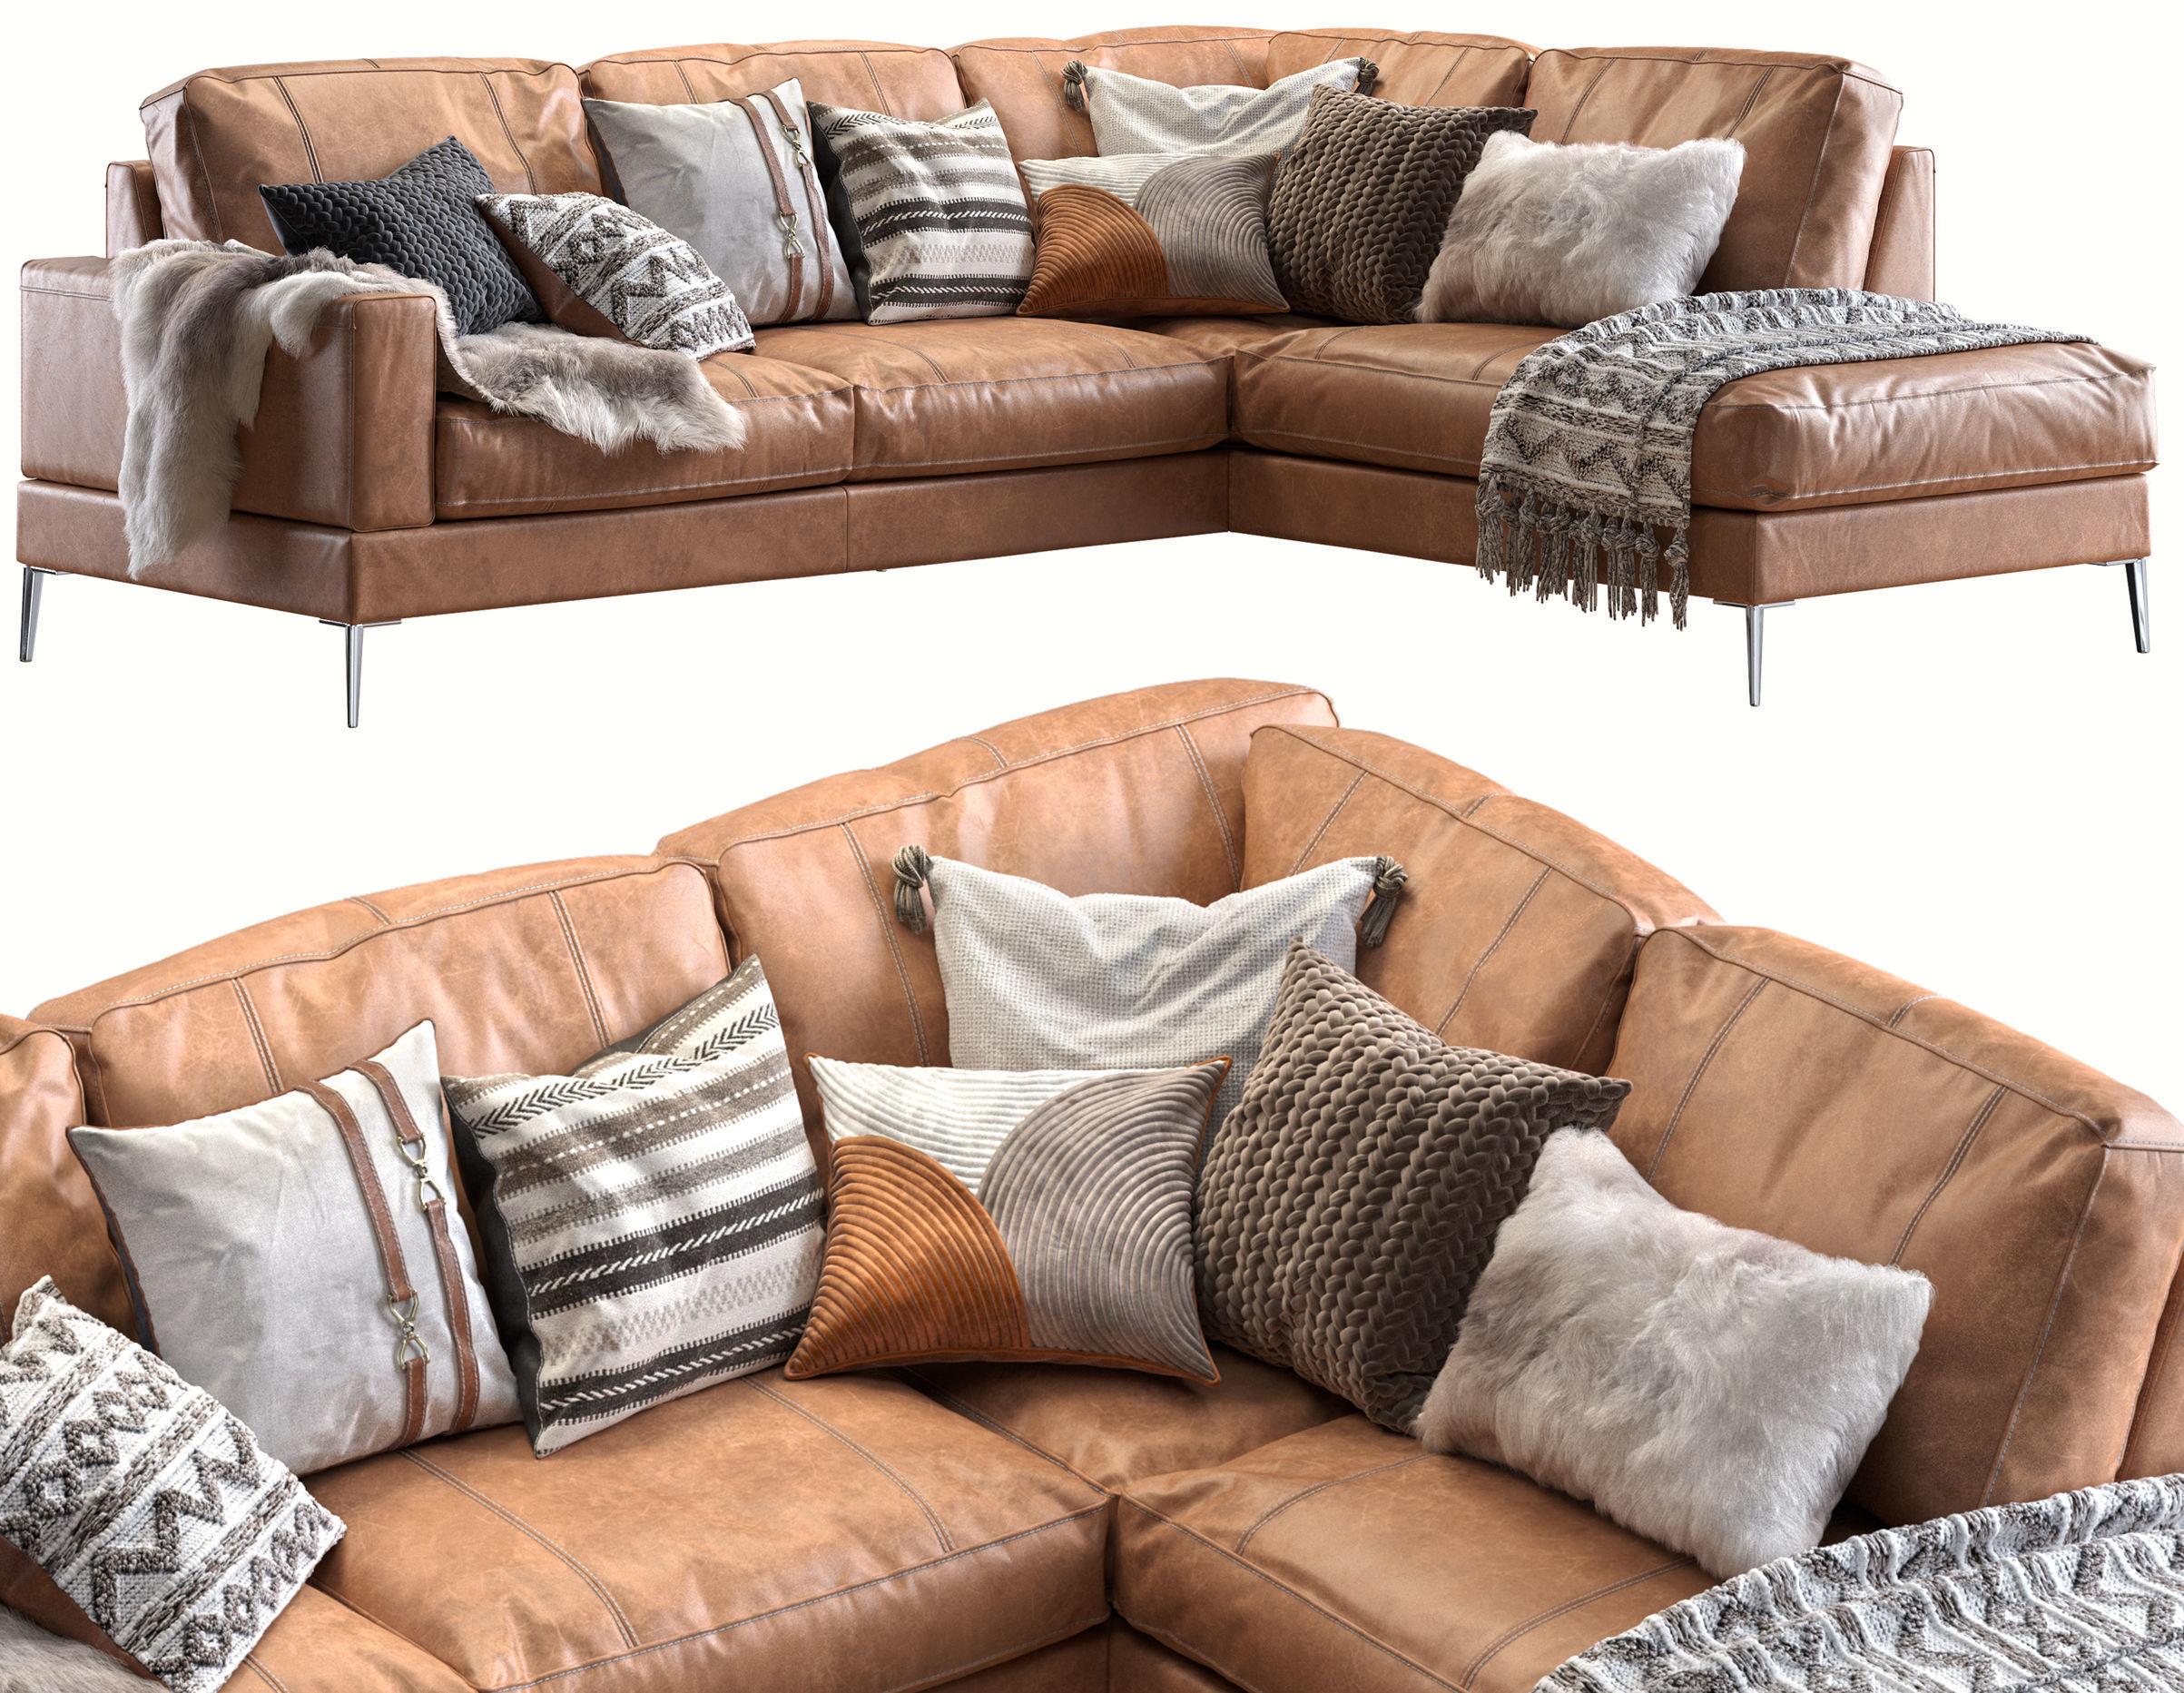 Capri sectional sofa 2